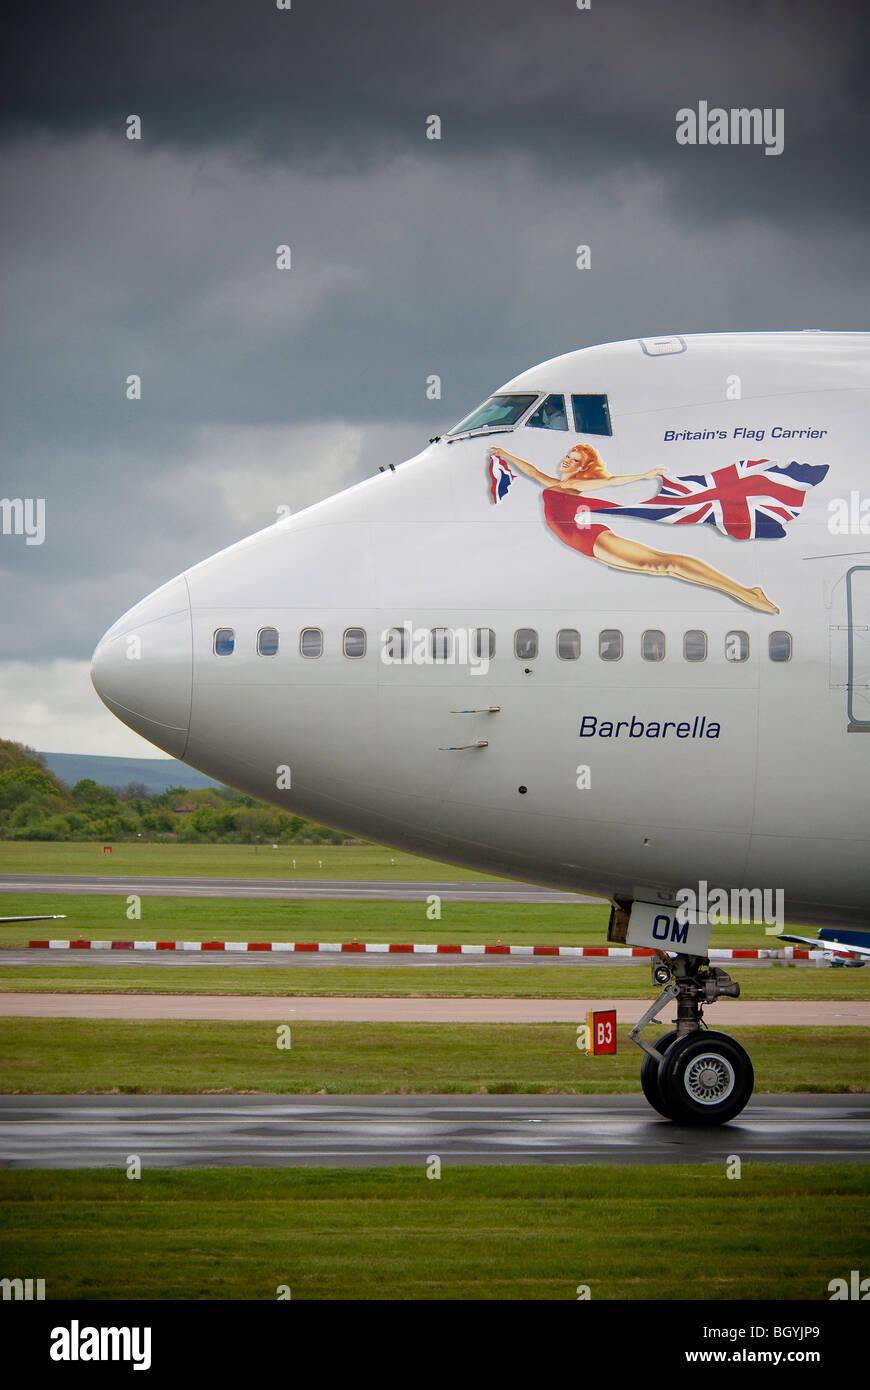 Virgin Atlantic Boeing 747-400 jumbo jet named Barbarella . Stock Photo